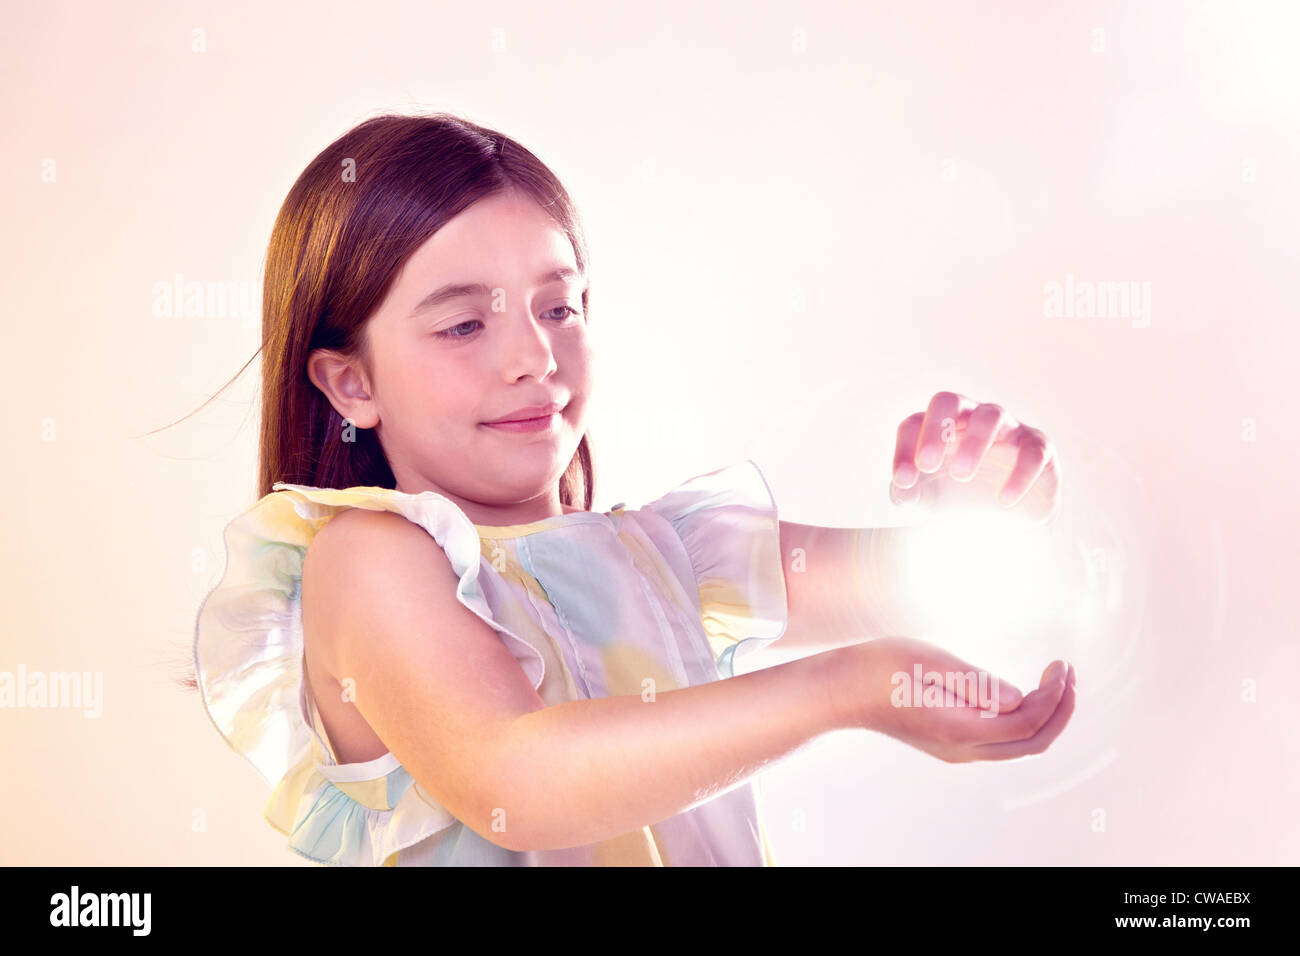 Girl holding a ball of light - Stock Image